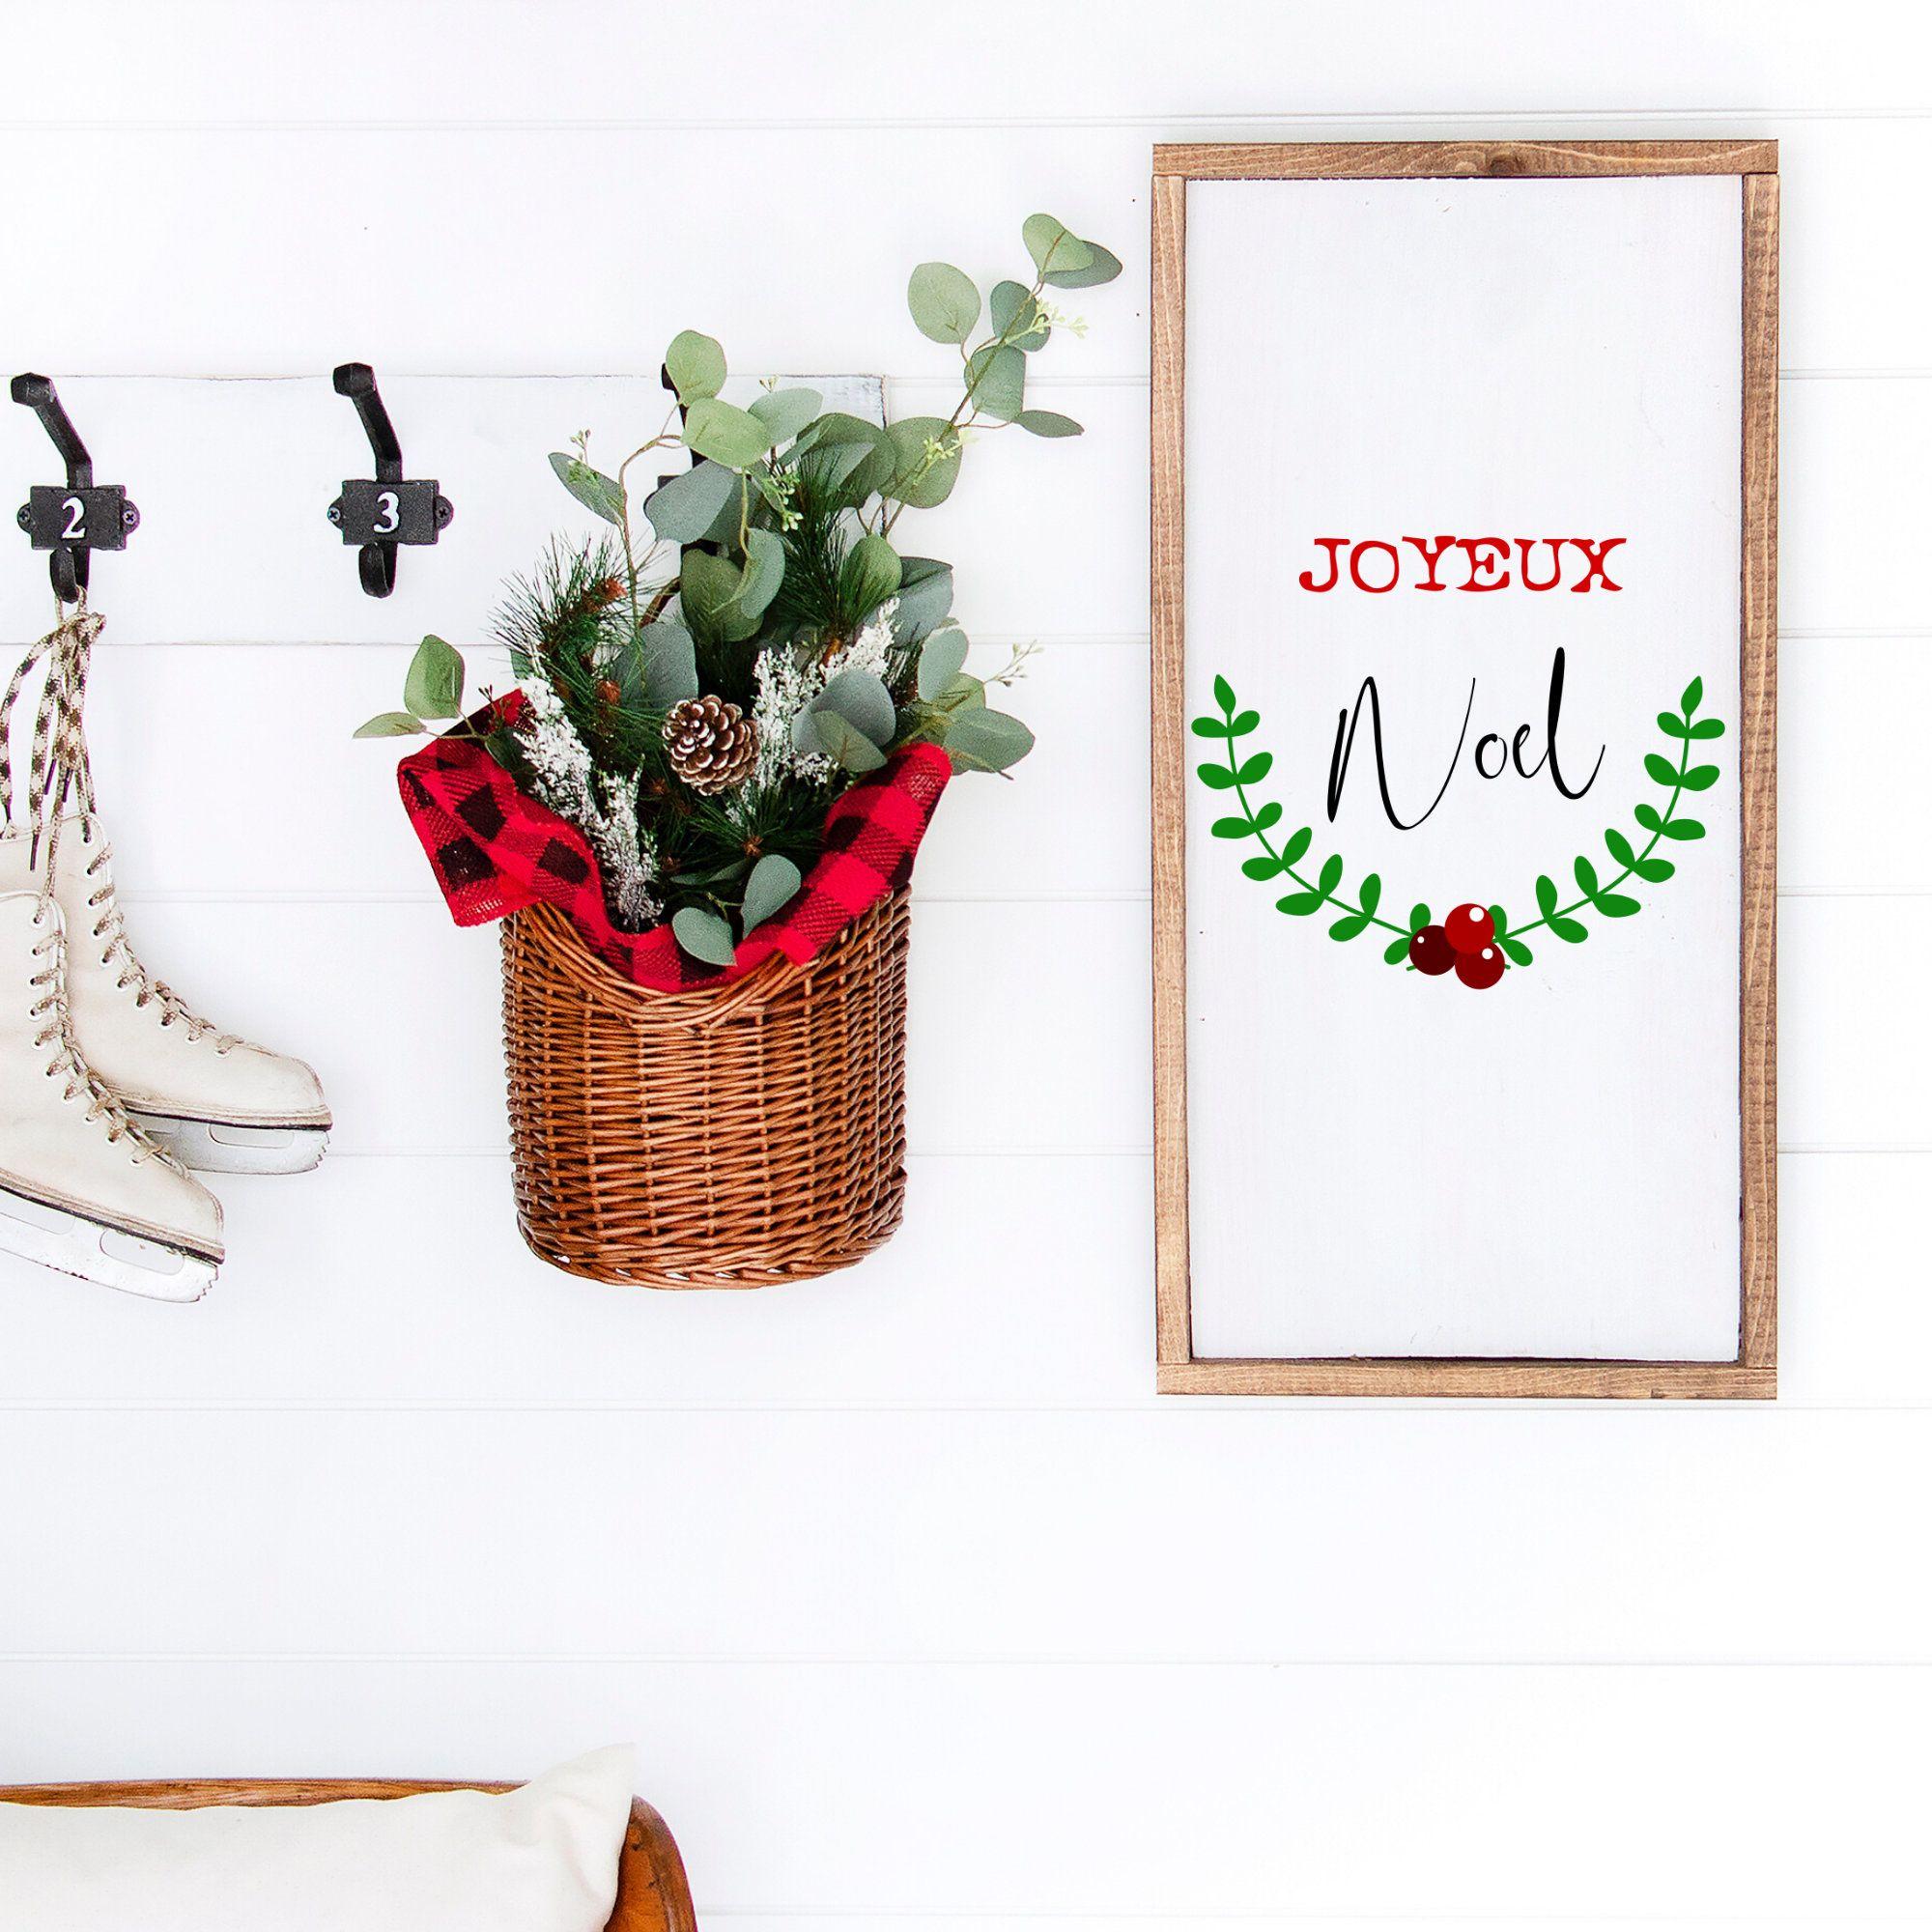 Joyeux Noel SVG Holly Art Christmas Wreath Christmas